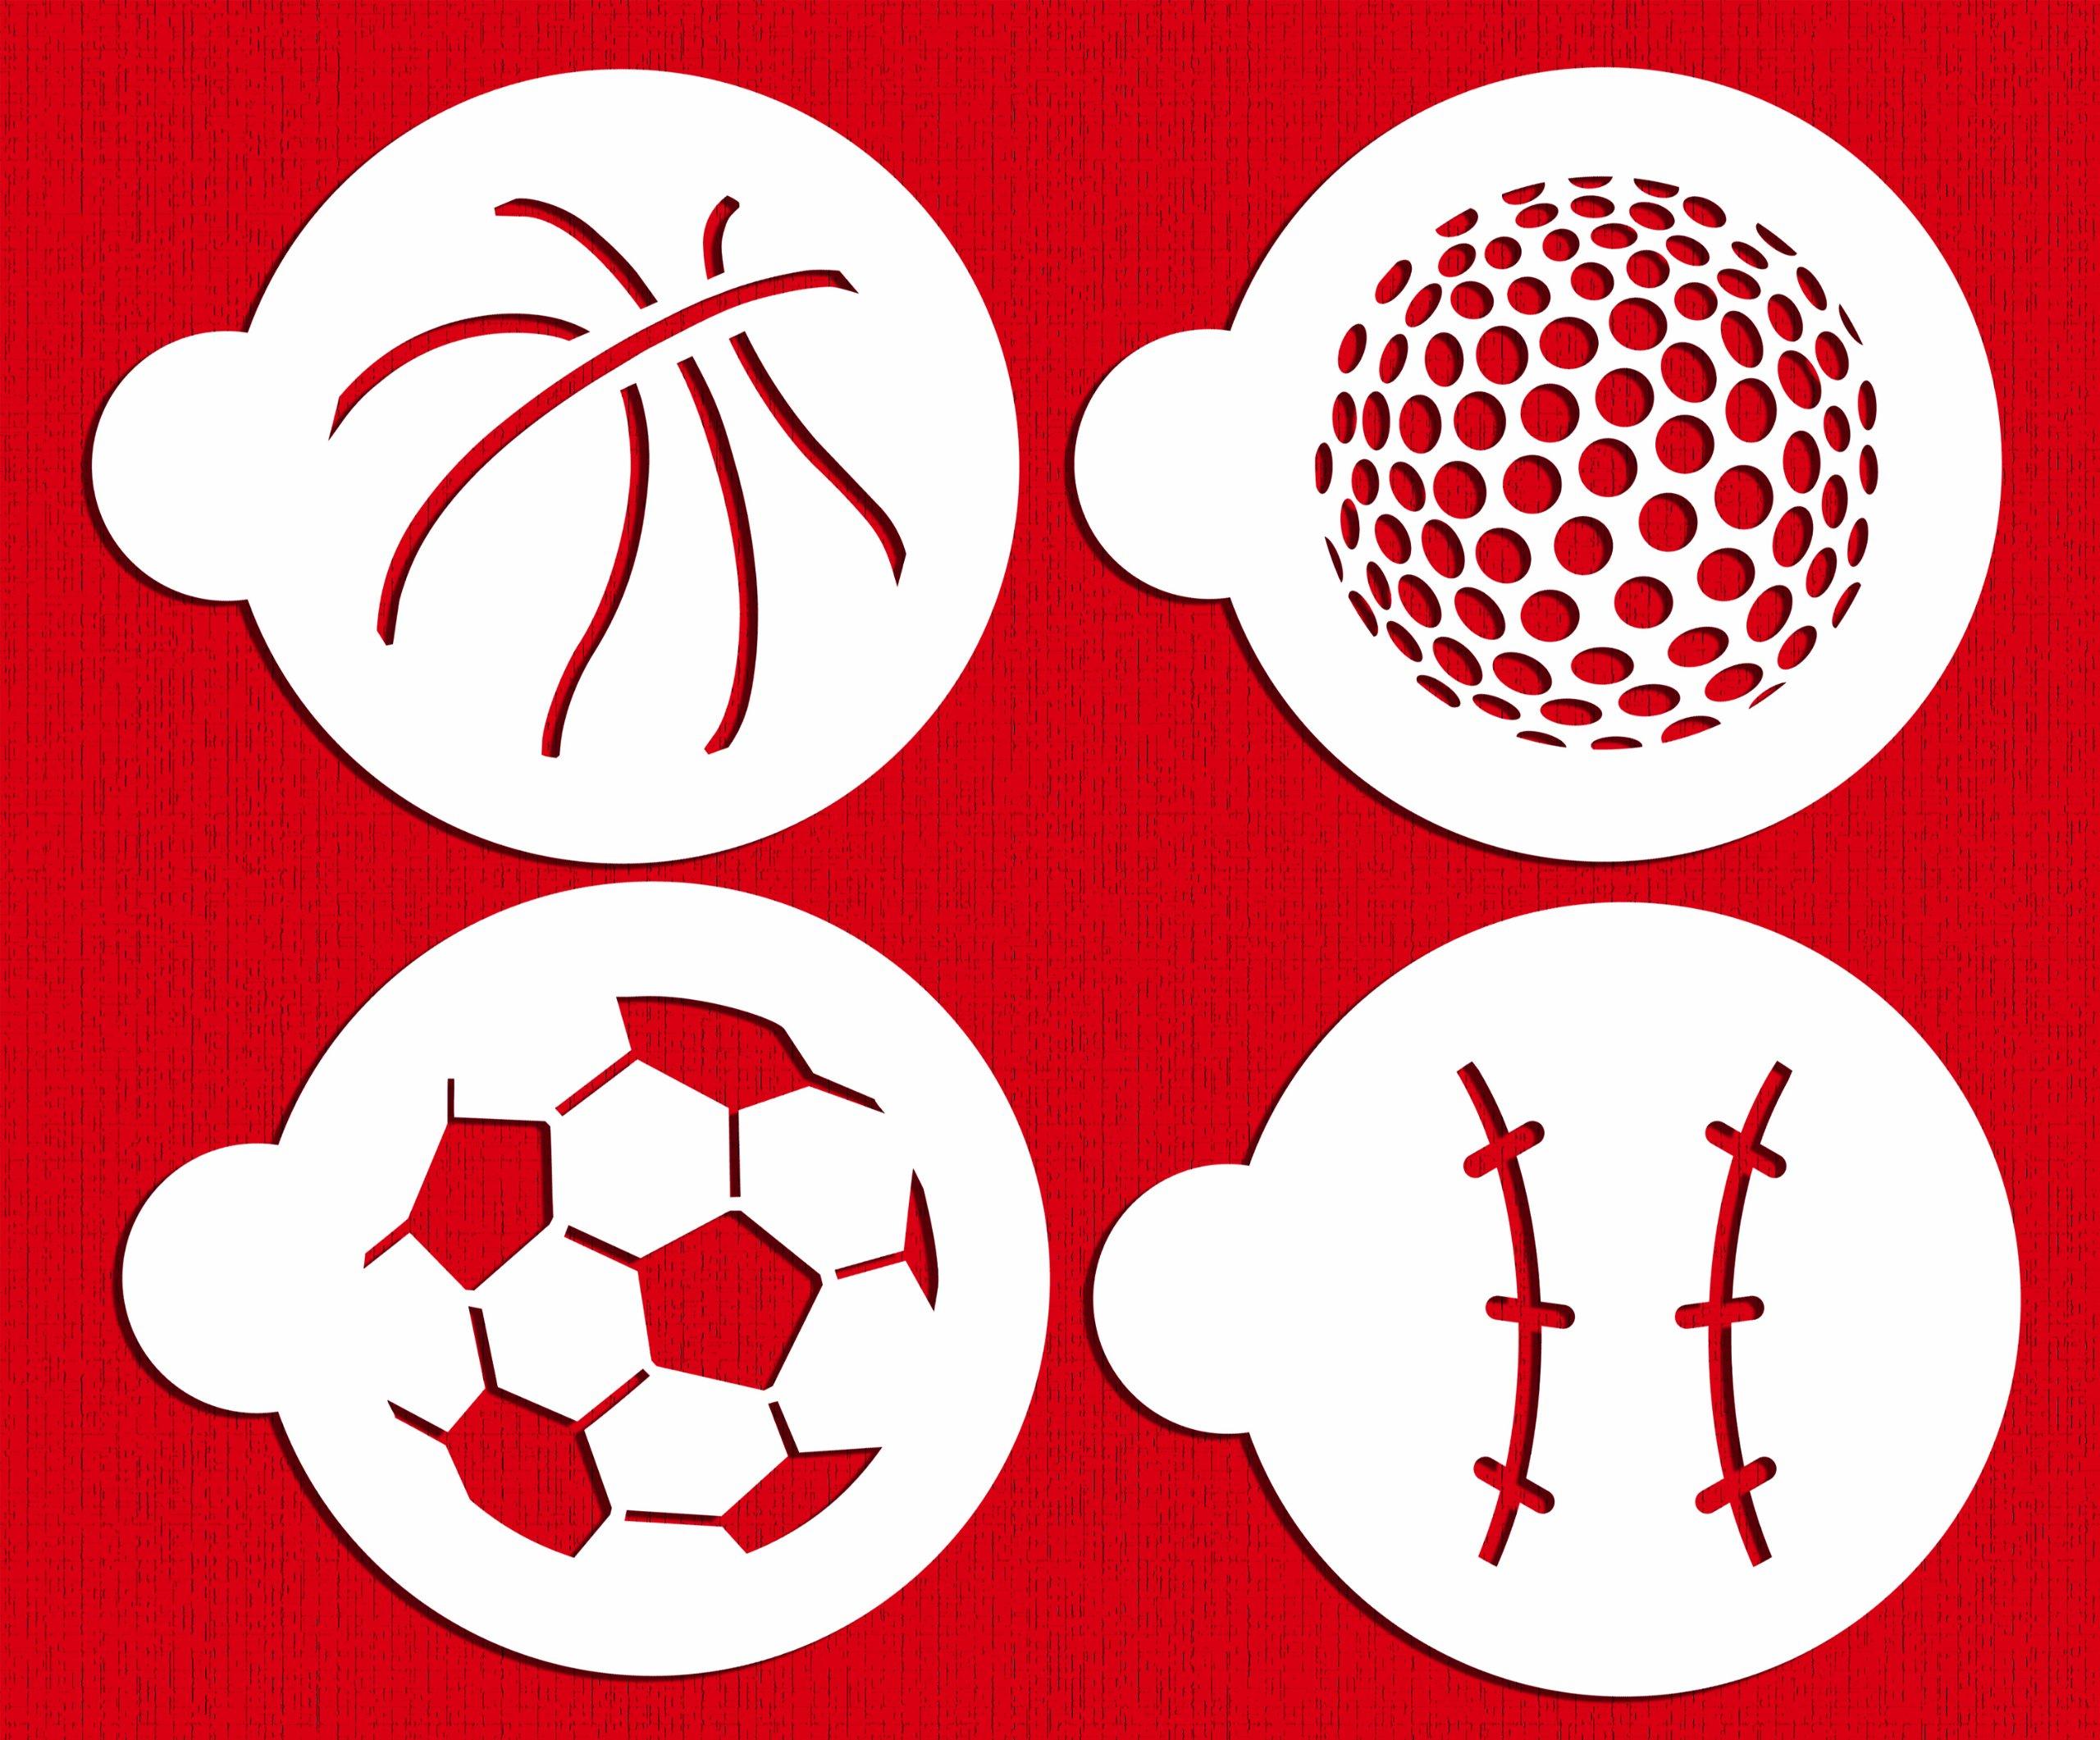 Designer Stencils C218 Large Sports Ball Cookie Stencils (Basketball - Golf - Soccer - Baseball), Beige/semi-transparent by Designer Stencils